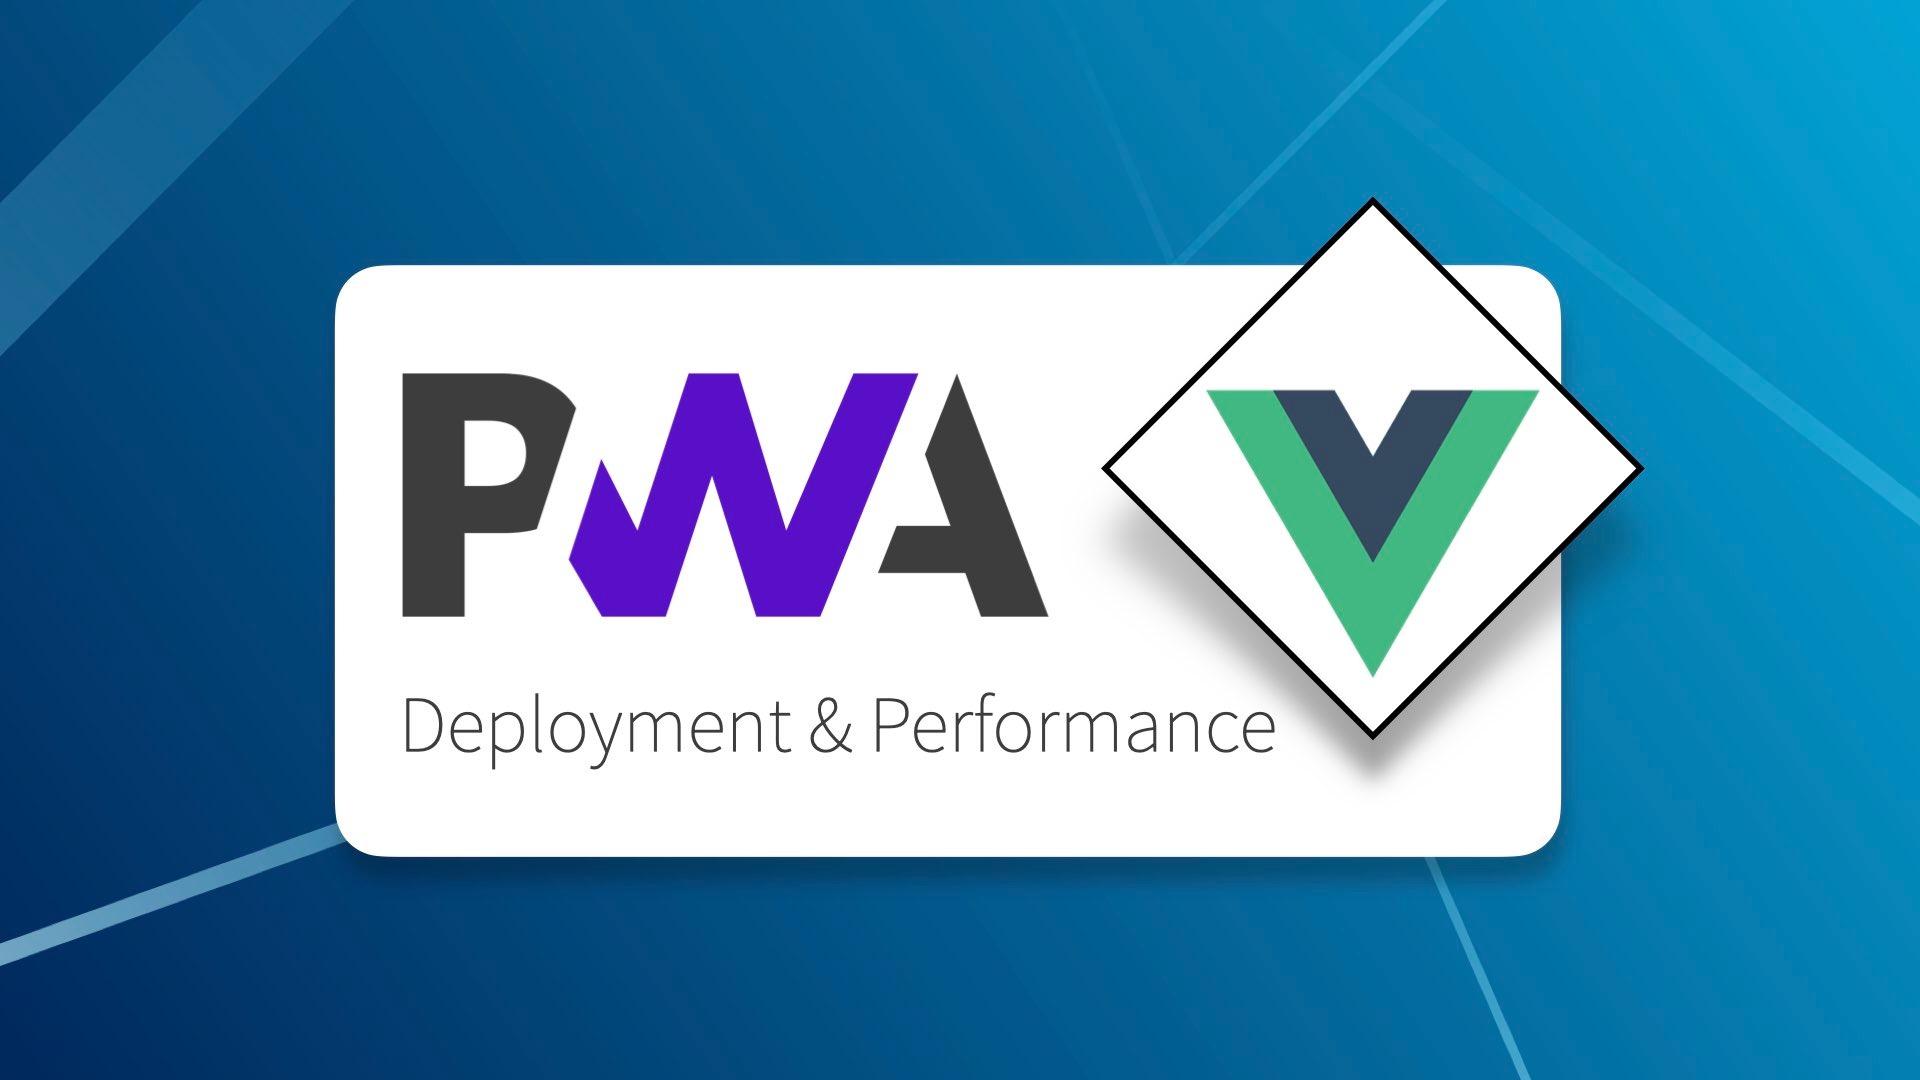 Vue 3 PWAs: Deployment & Performance